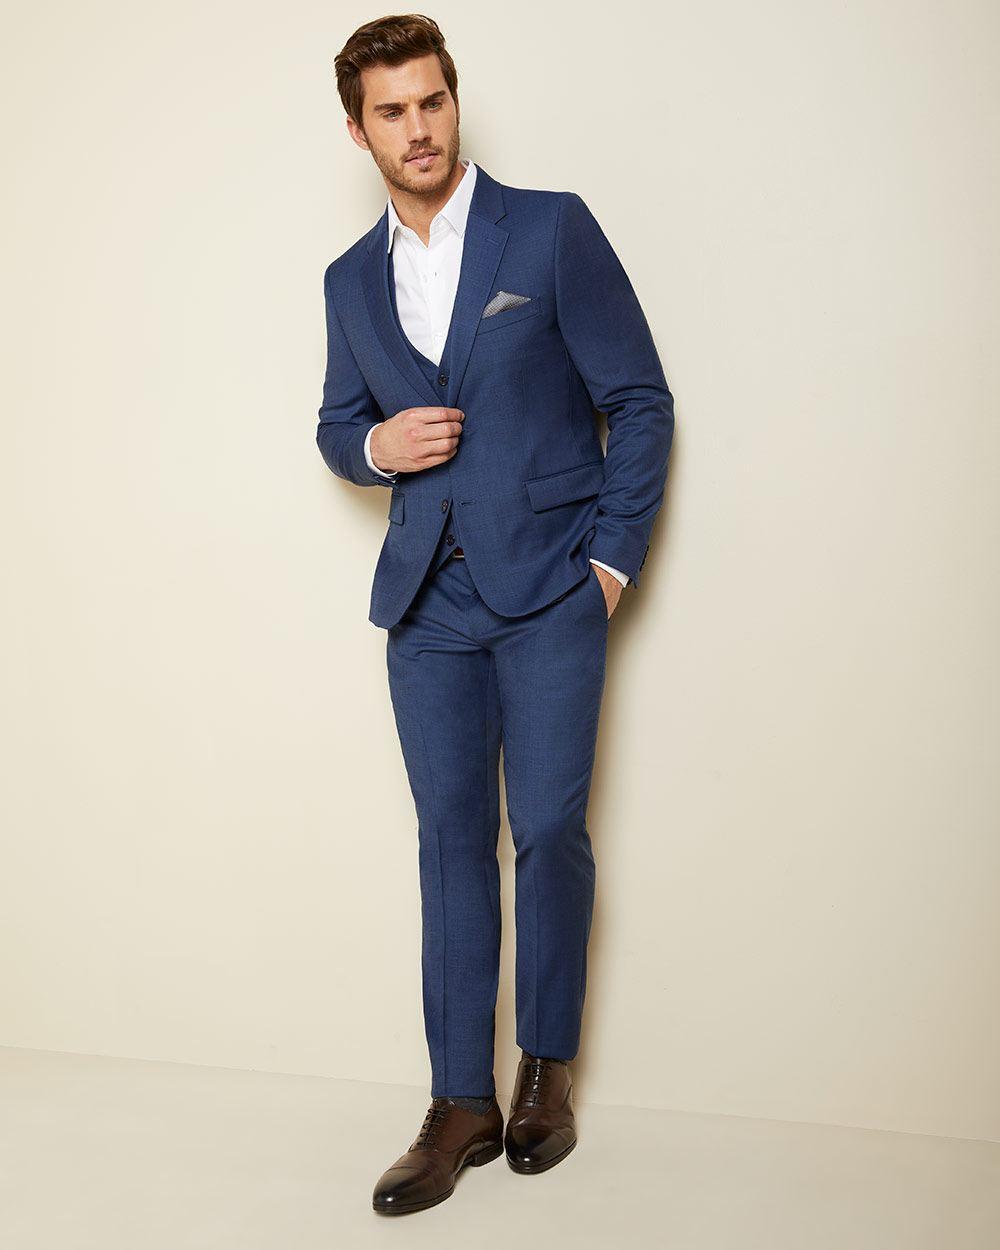 15227f97008732 Essential Slim Fit blue wool-blend suit Blazer - Short | RW&CO.